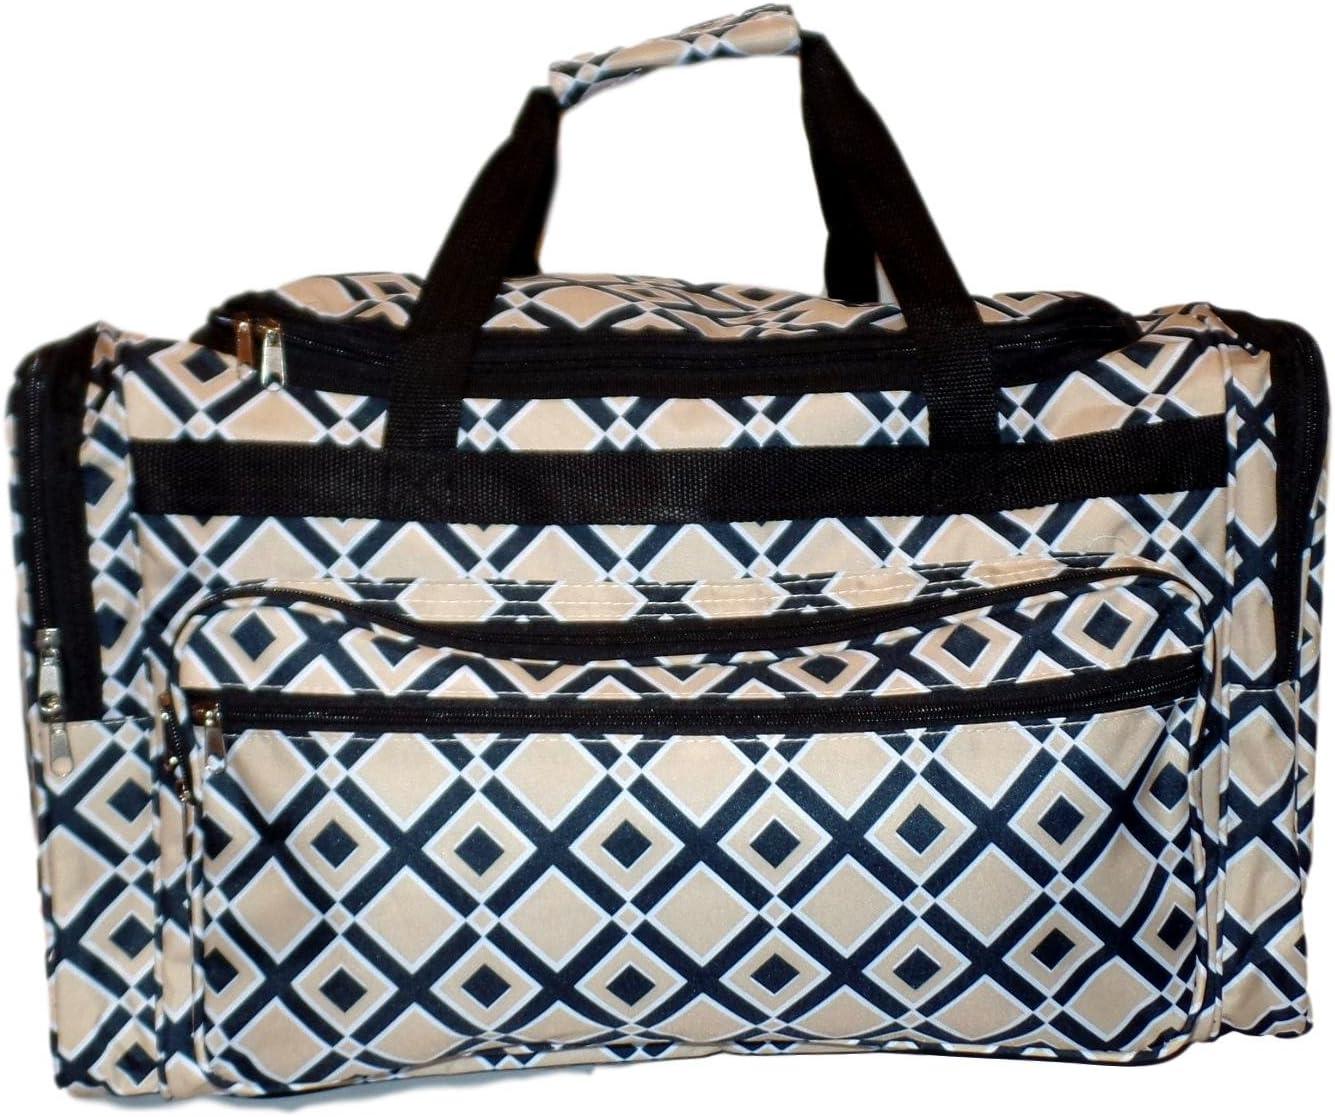 High Fashion Print Gym Dance Cheer Travel Duffle Bag 22 BLANK-Diamond Blue - Navy